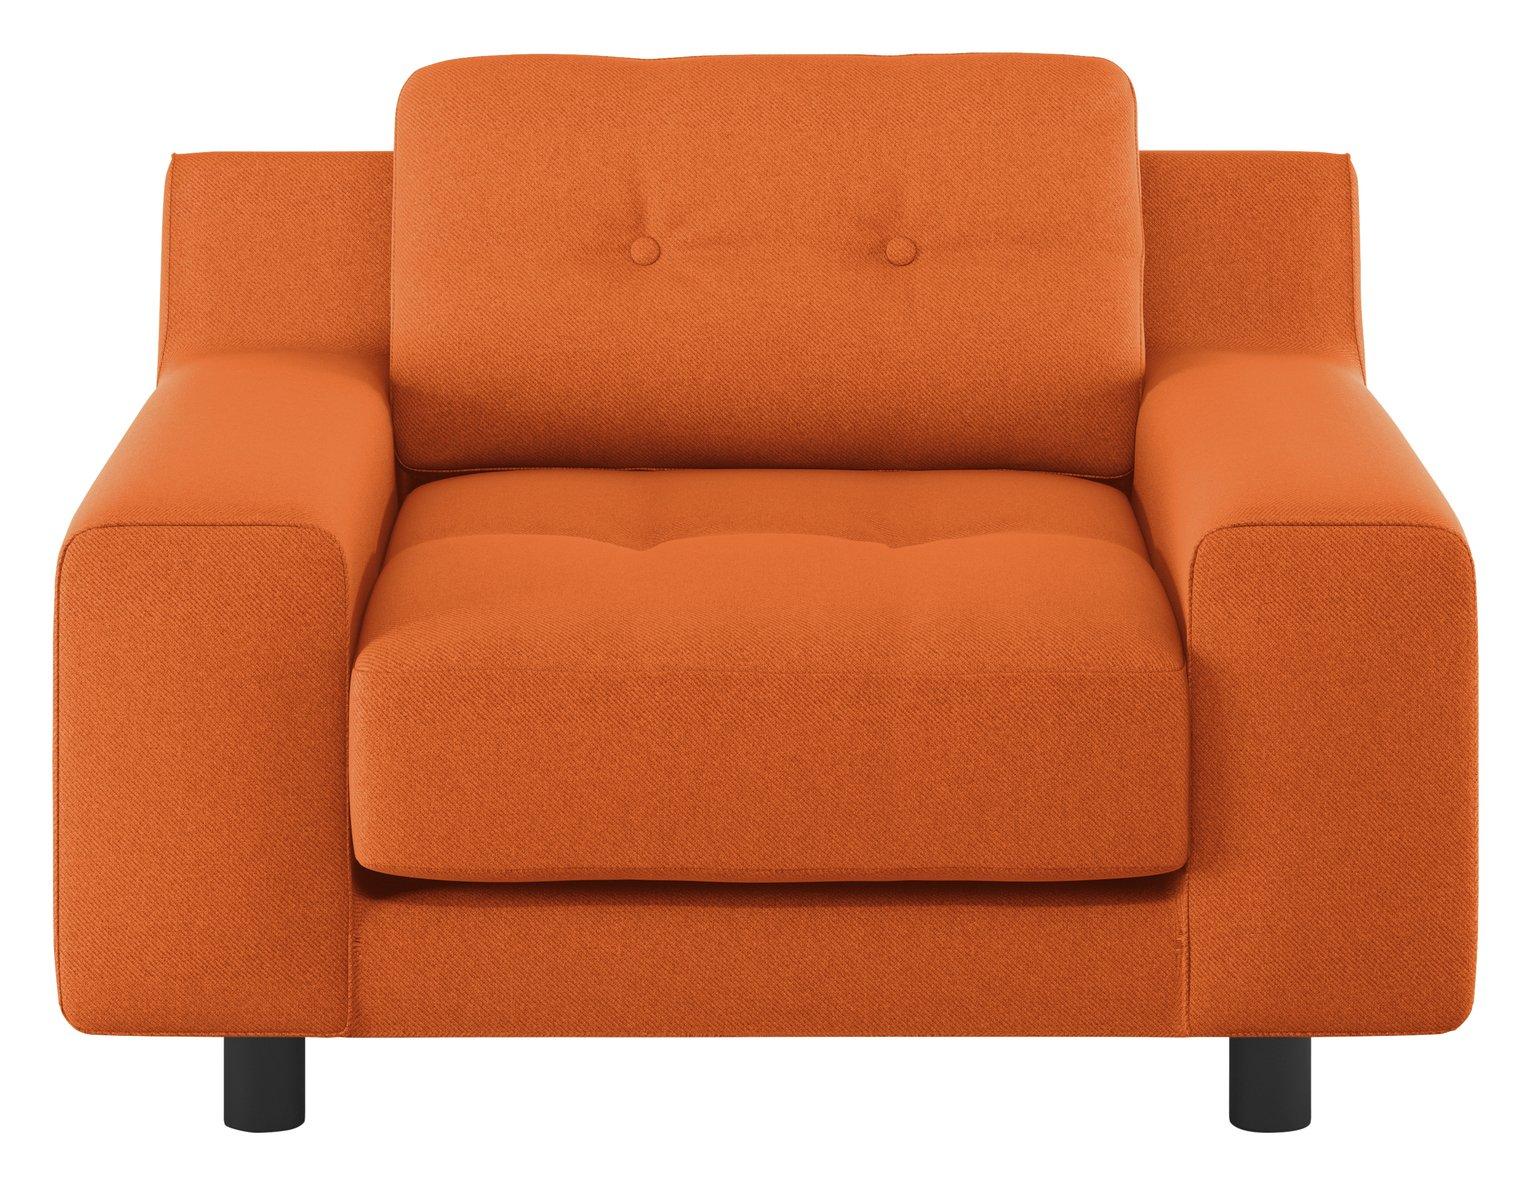 Habitat Hendricks Orange Fabric Armchair